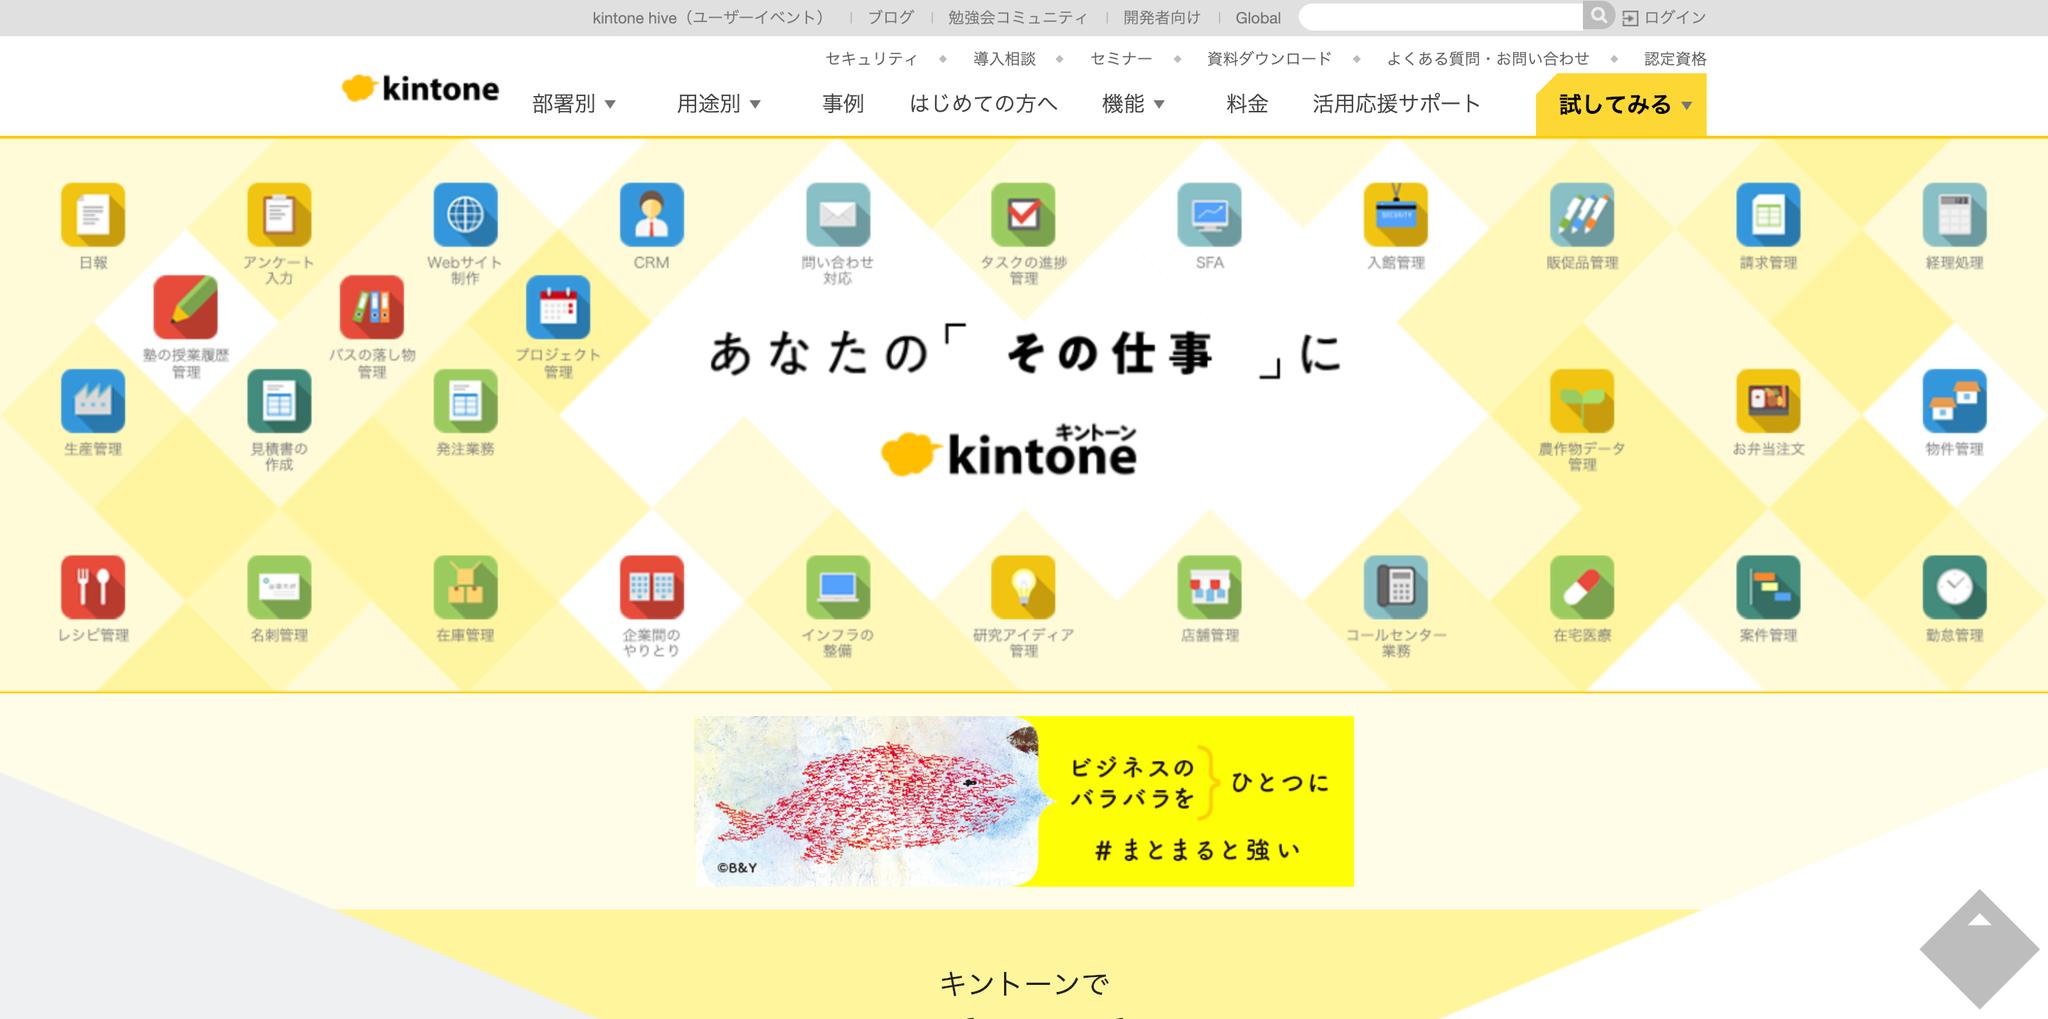 kintone.png